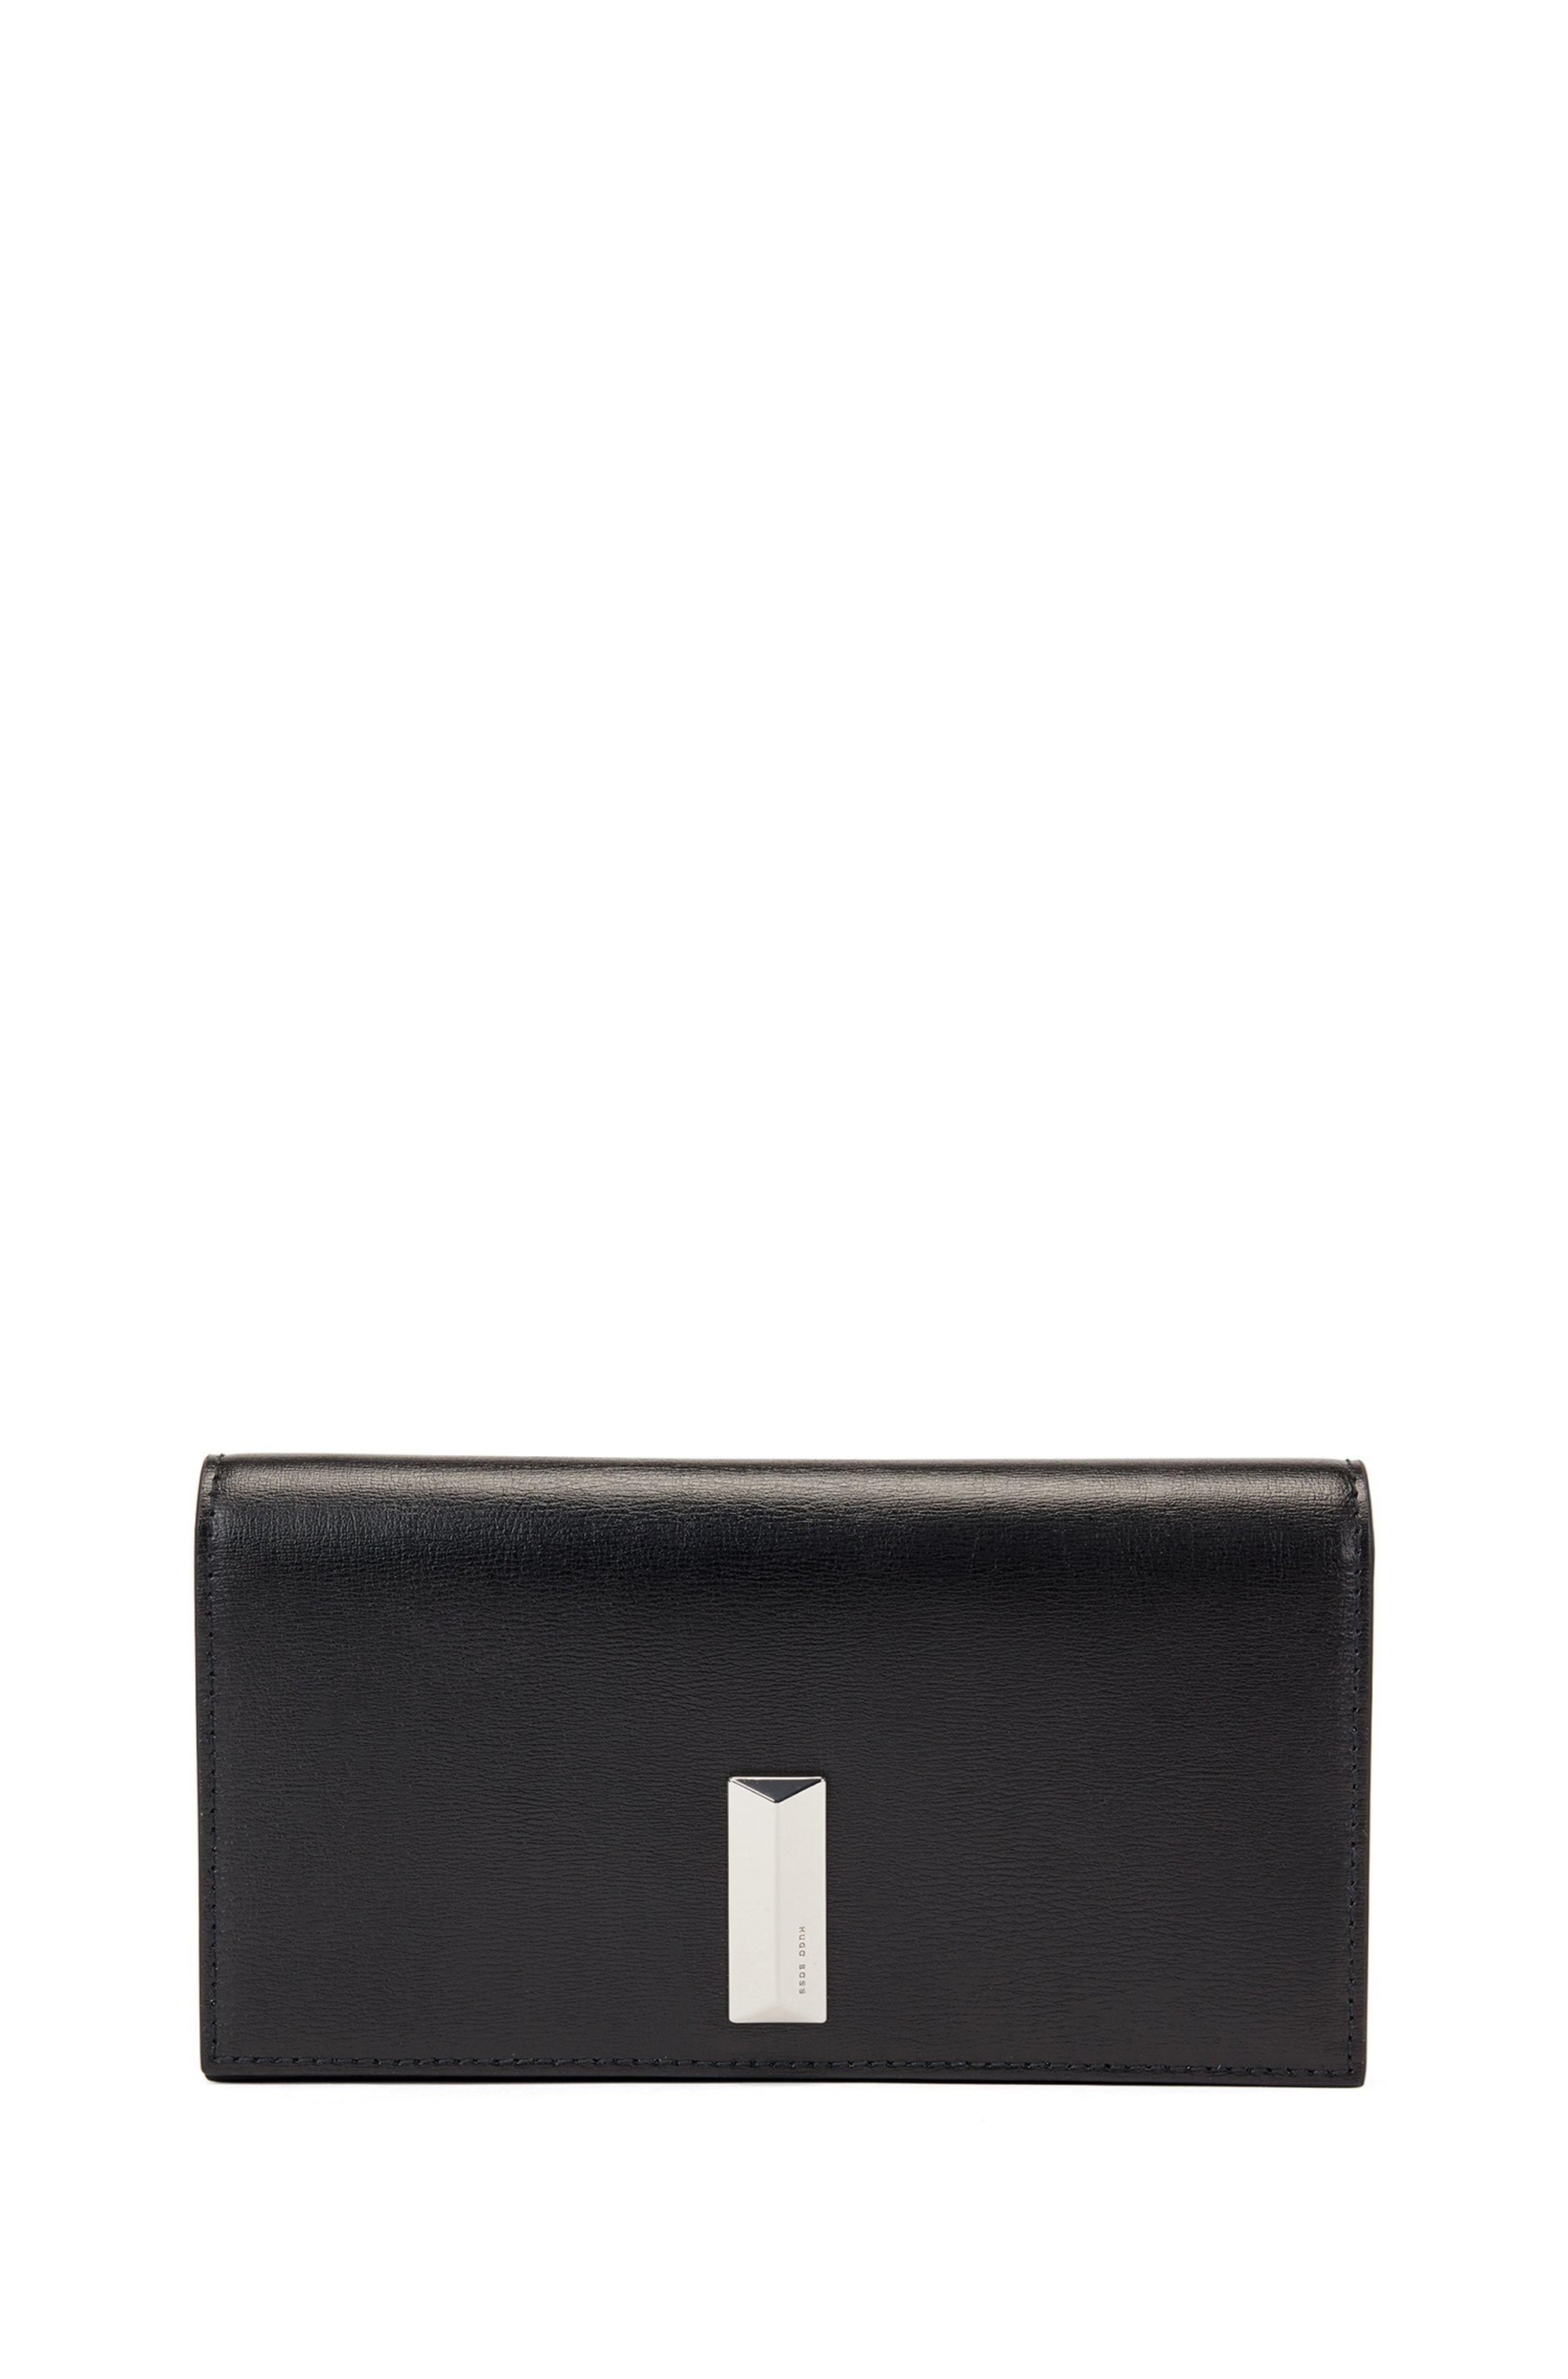 Mini sac en cuir avec garniture métallique en forme de pyramide, Noir